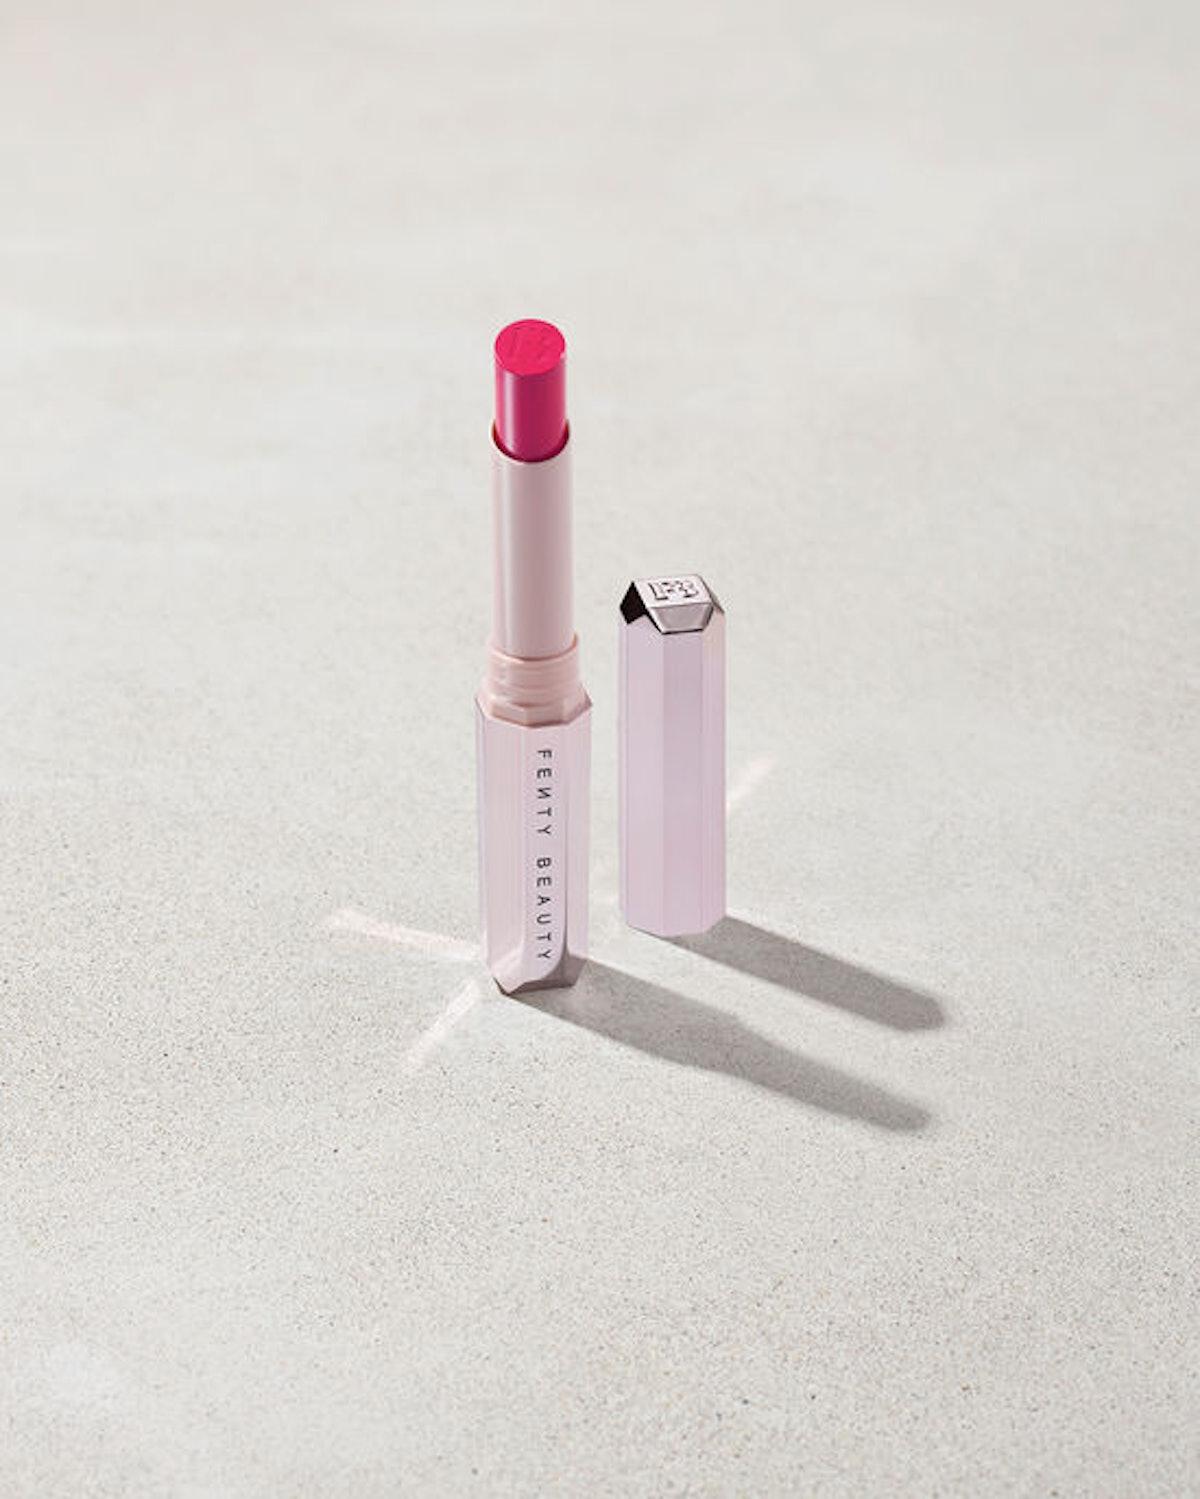 Fenty Beauty by Rihanna Mattemoiselle Plush Matte Lipstick